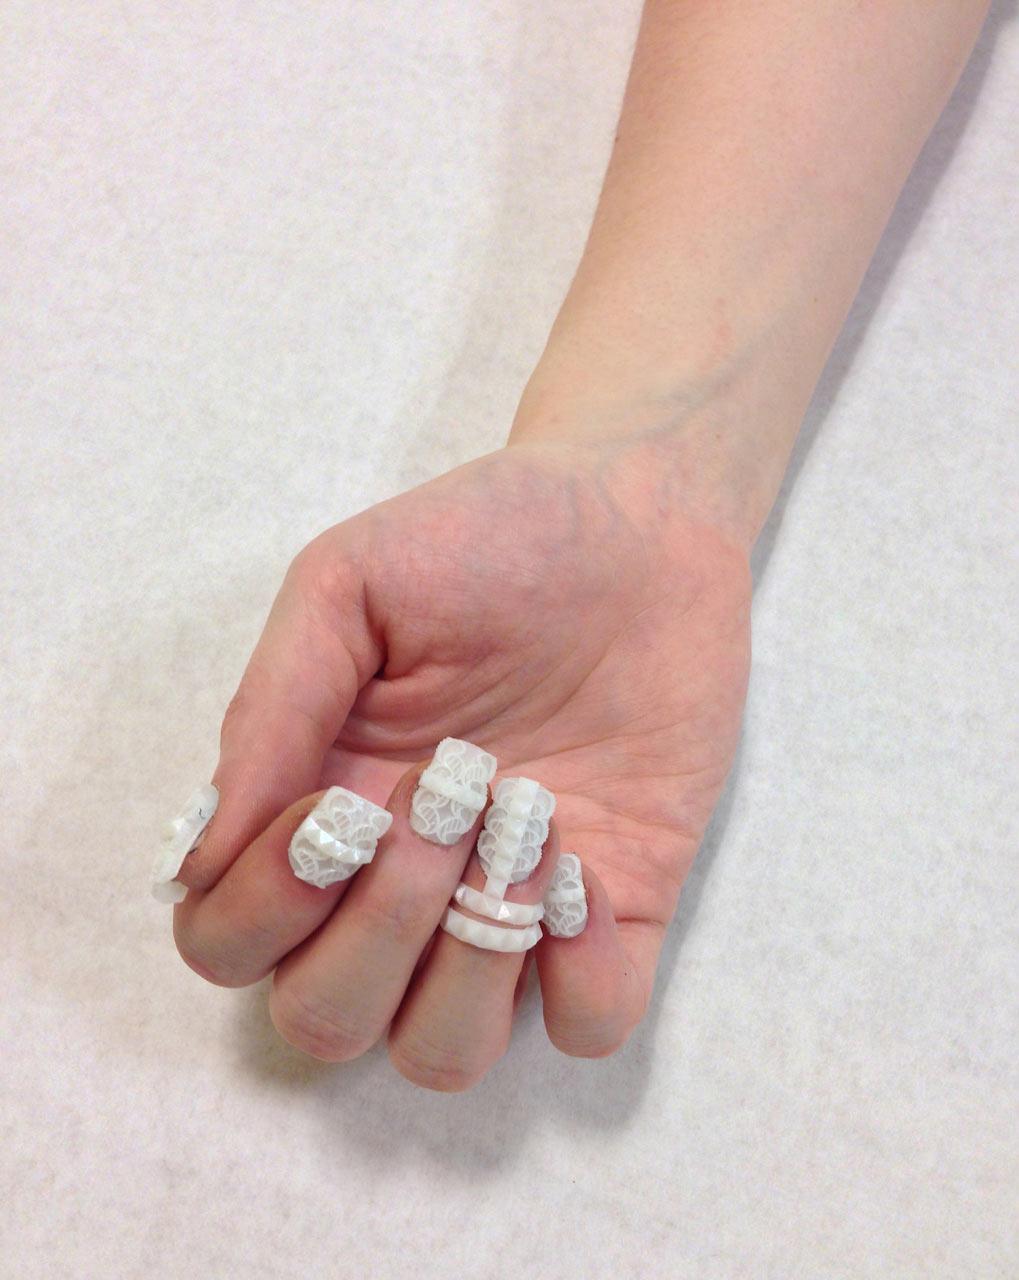 TheLaserGirls-3D-Printed-Nails-5-eatherlaceandleo